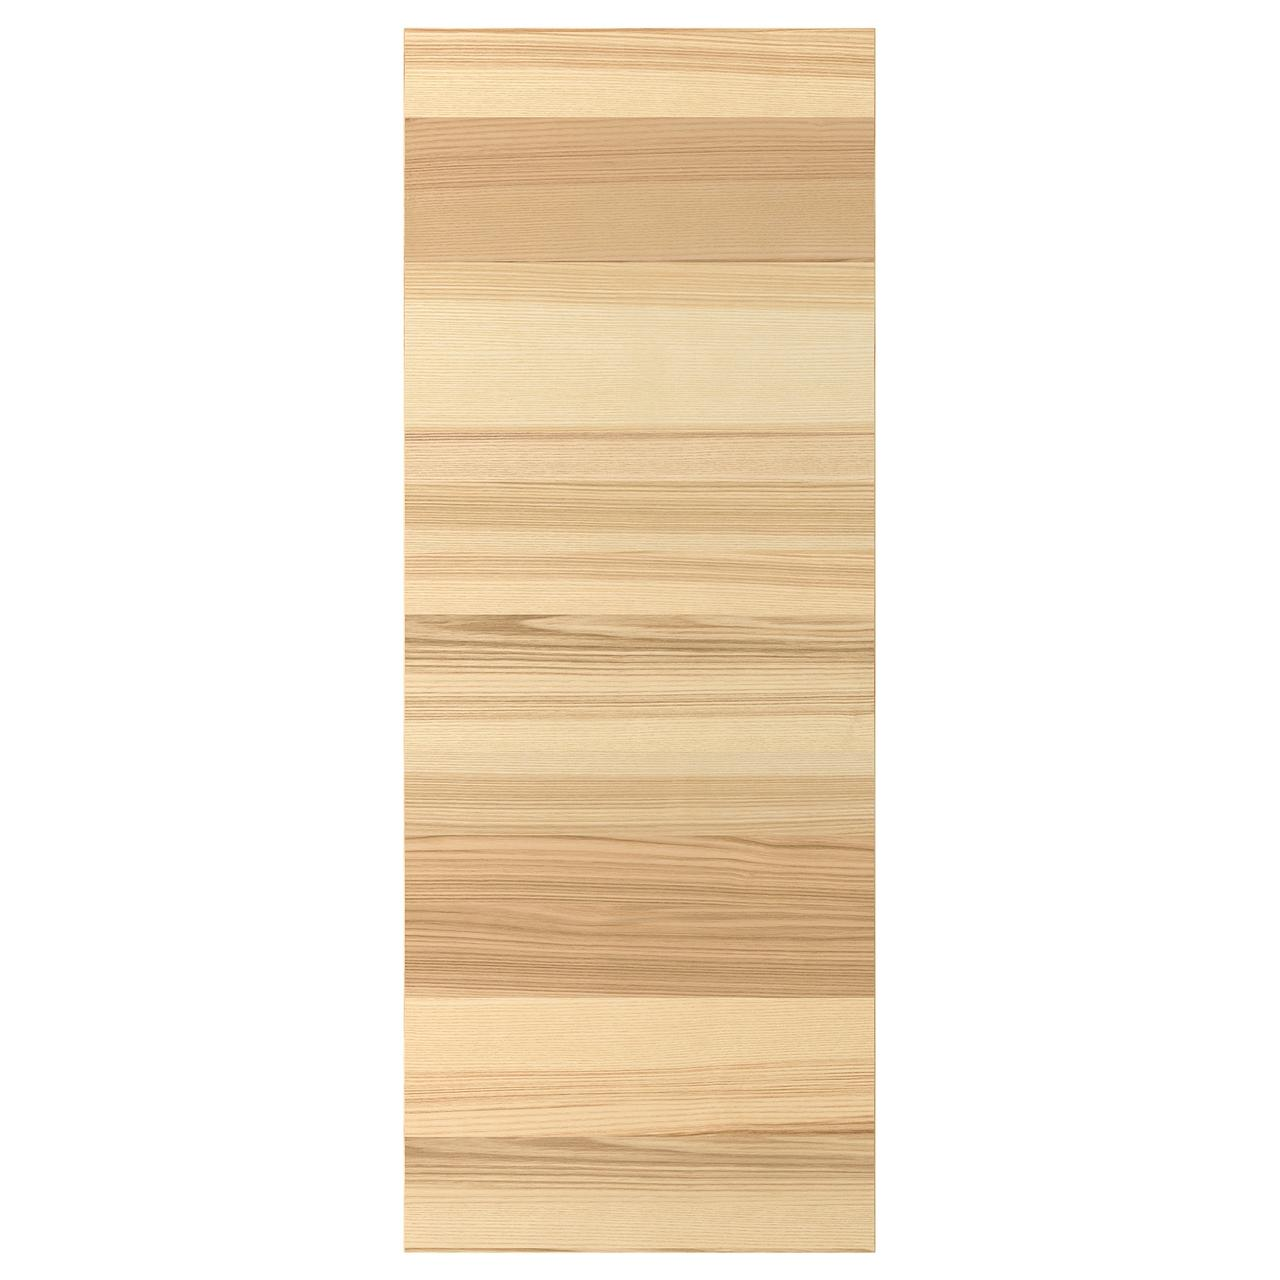 IKEA Накладна панель TORHAMN (ІКЕА ТОРХЭМН) 20313401